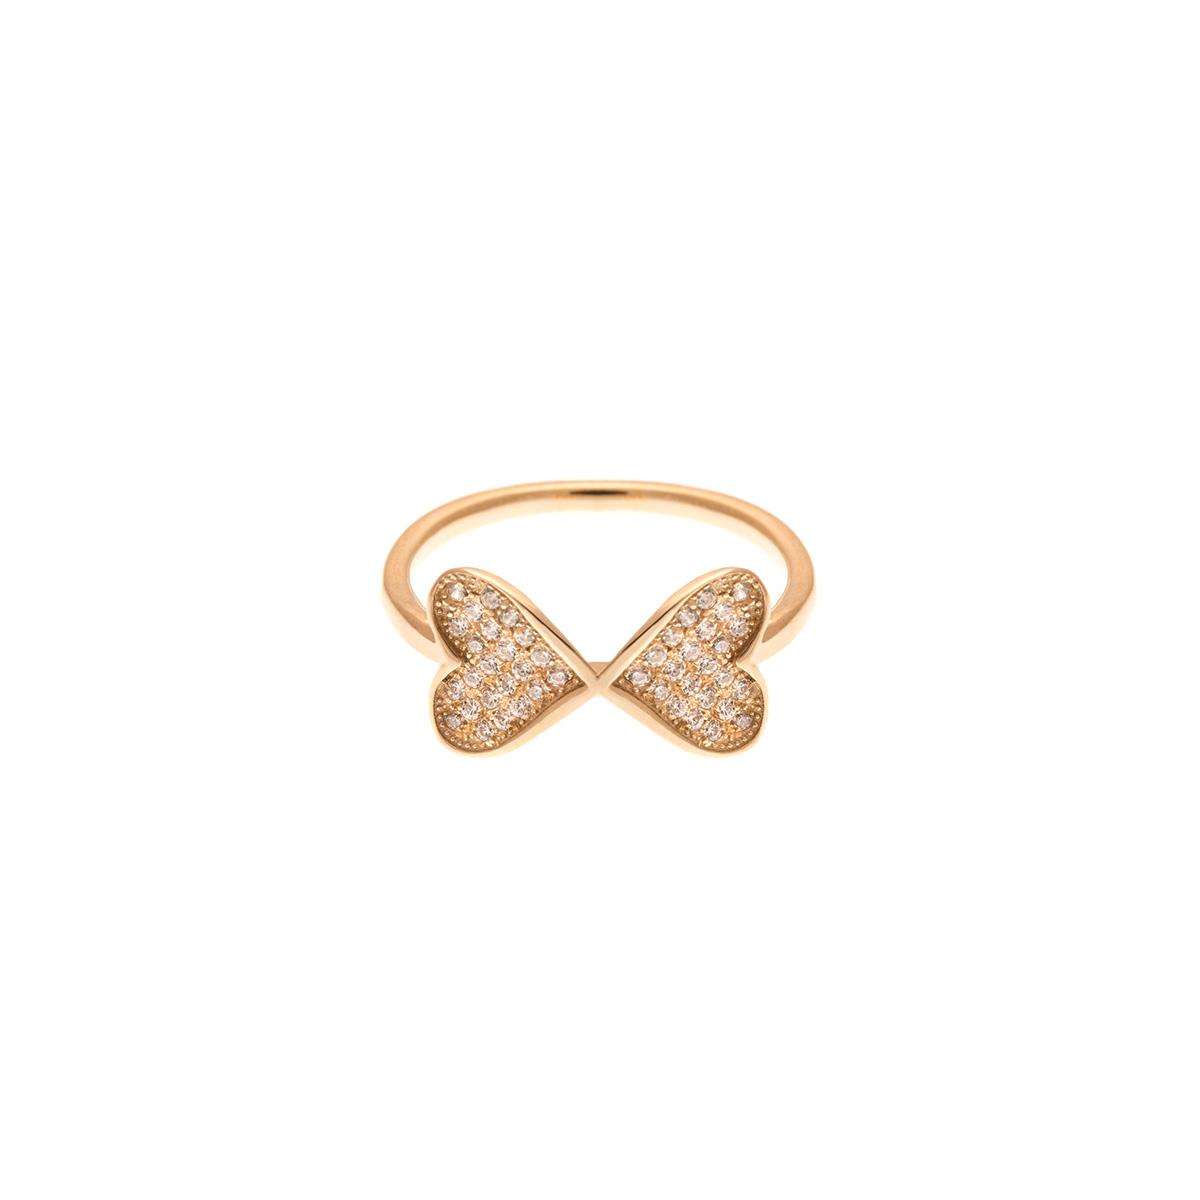 انگشتر طلا دو قلب نگین دار